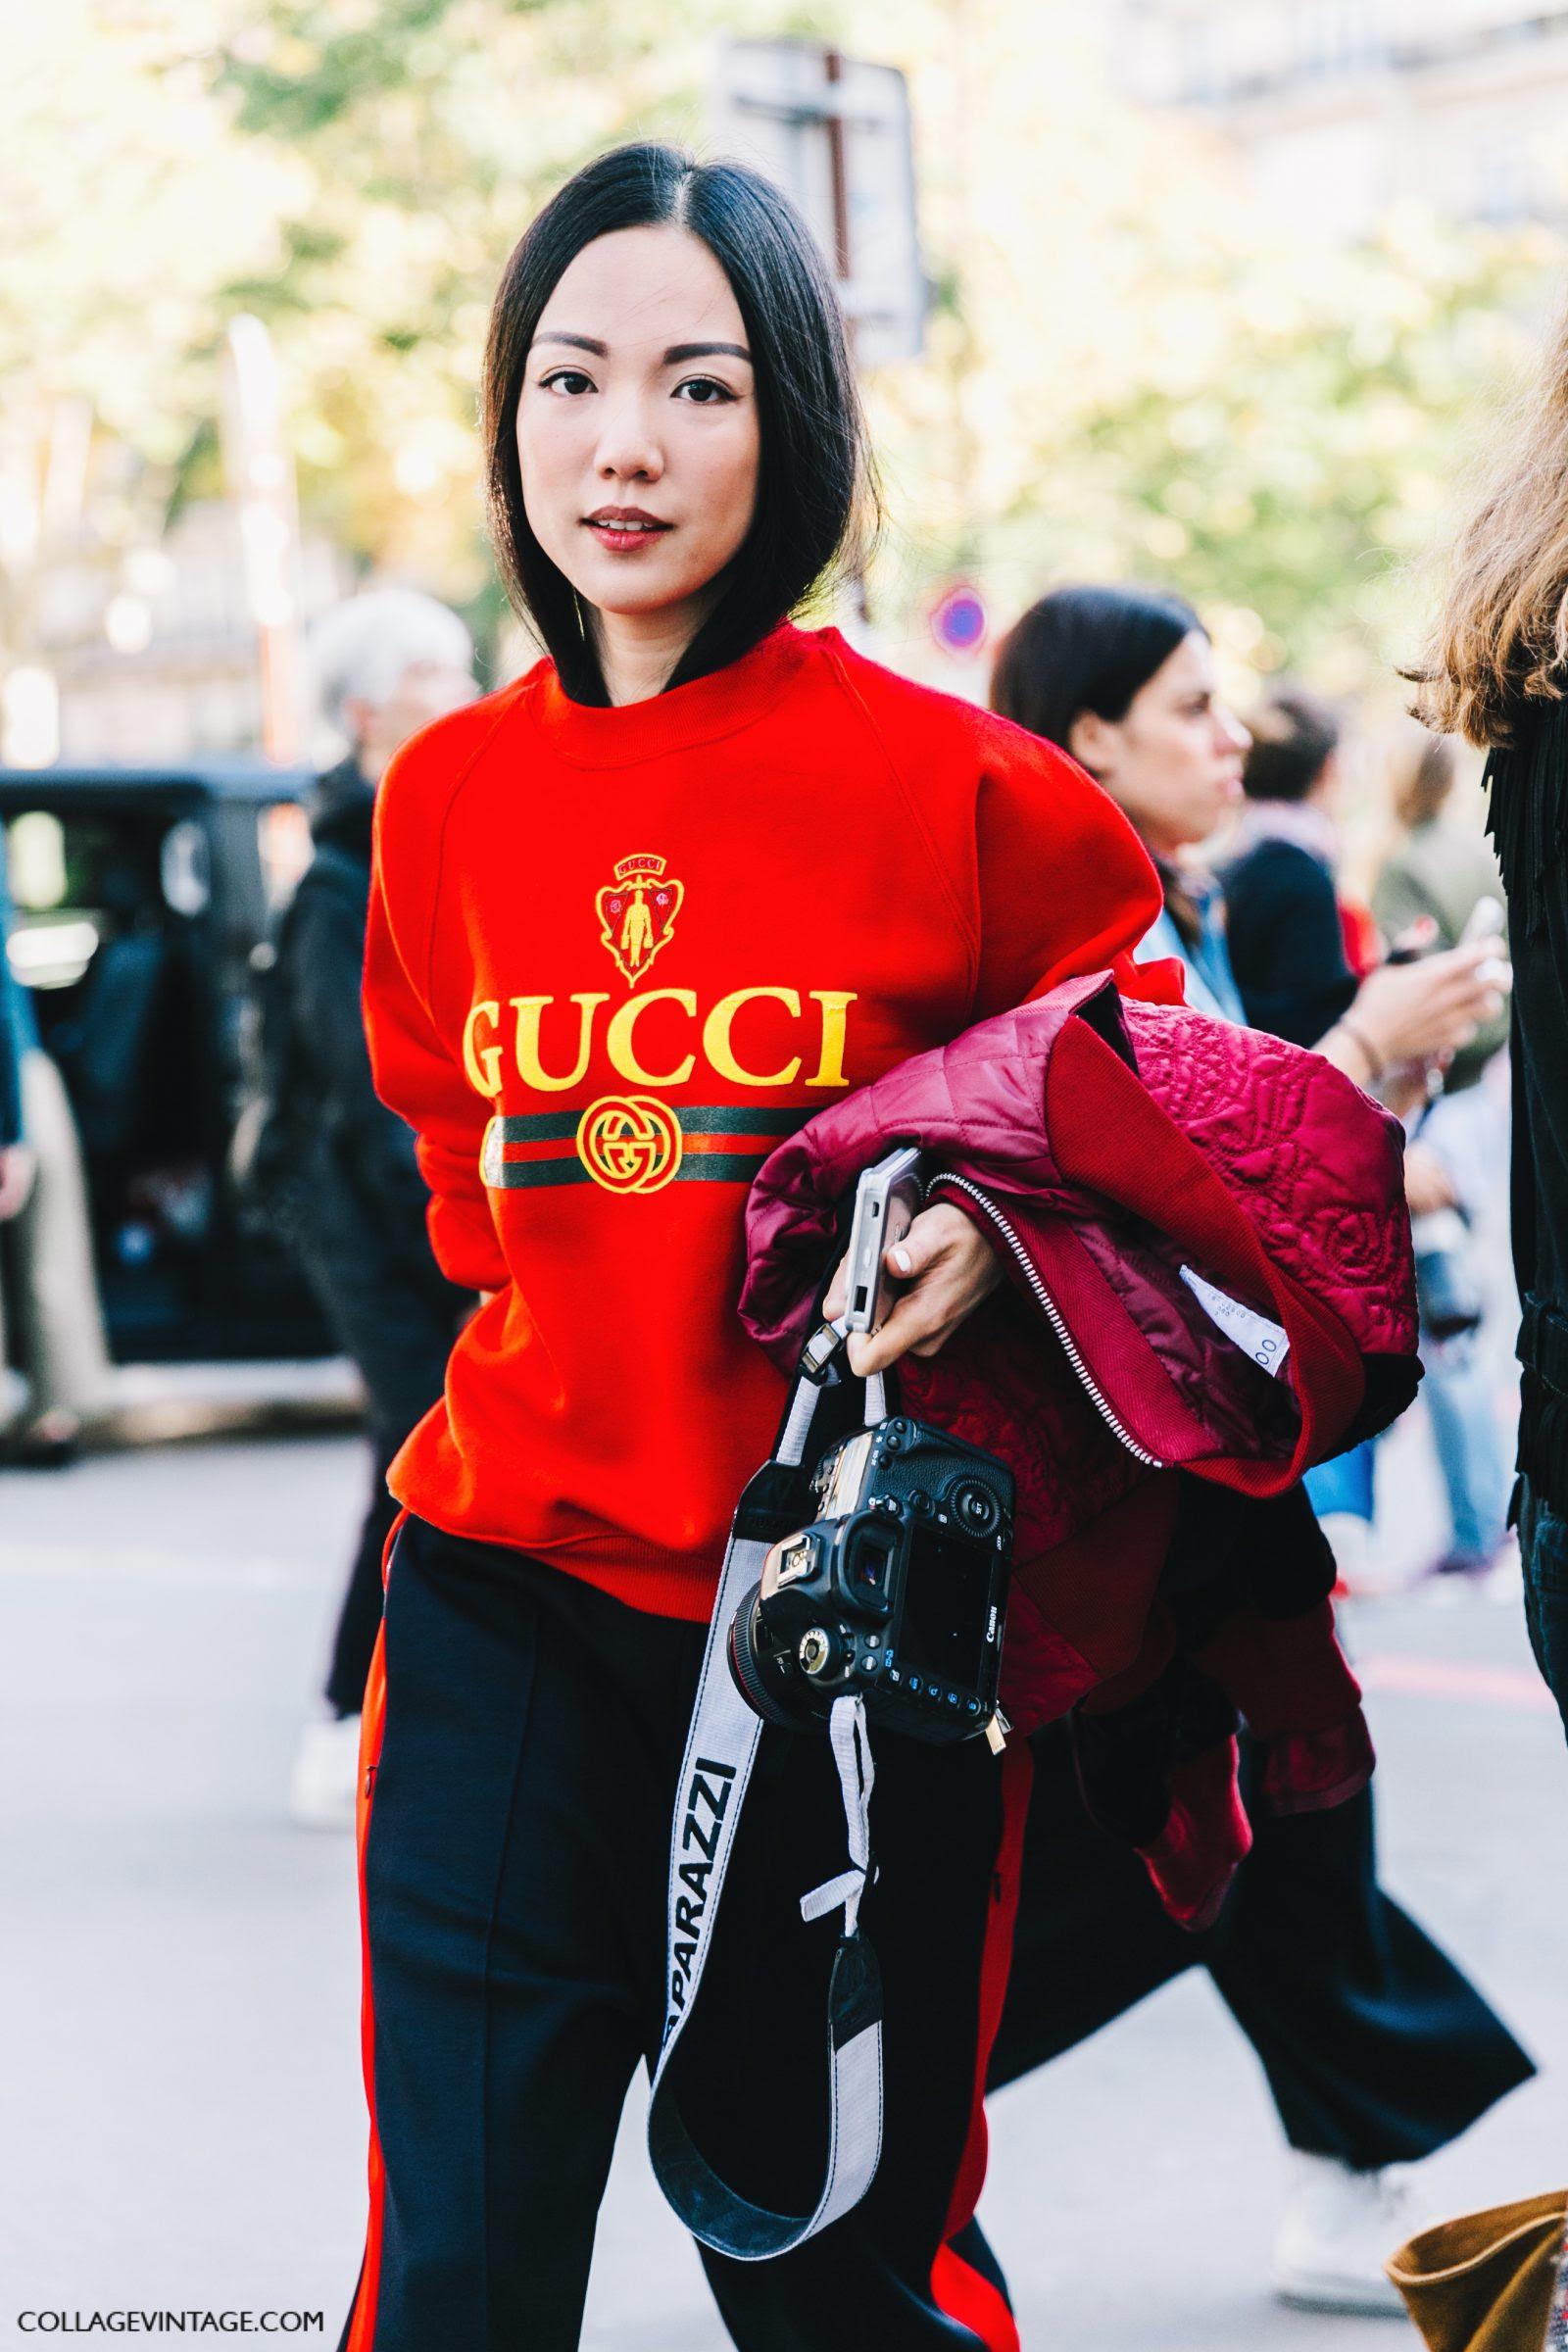 Pfw-paris_fashion_week_ss17-street_style-outfits-collage_vintage-olympia_letan-hermes-stella_mccartney-sacai-52